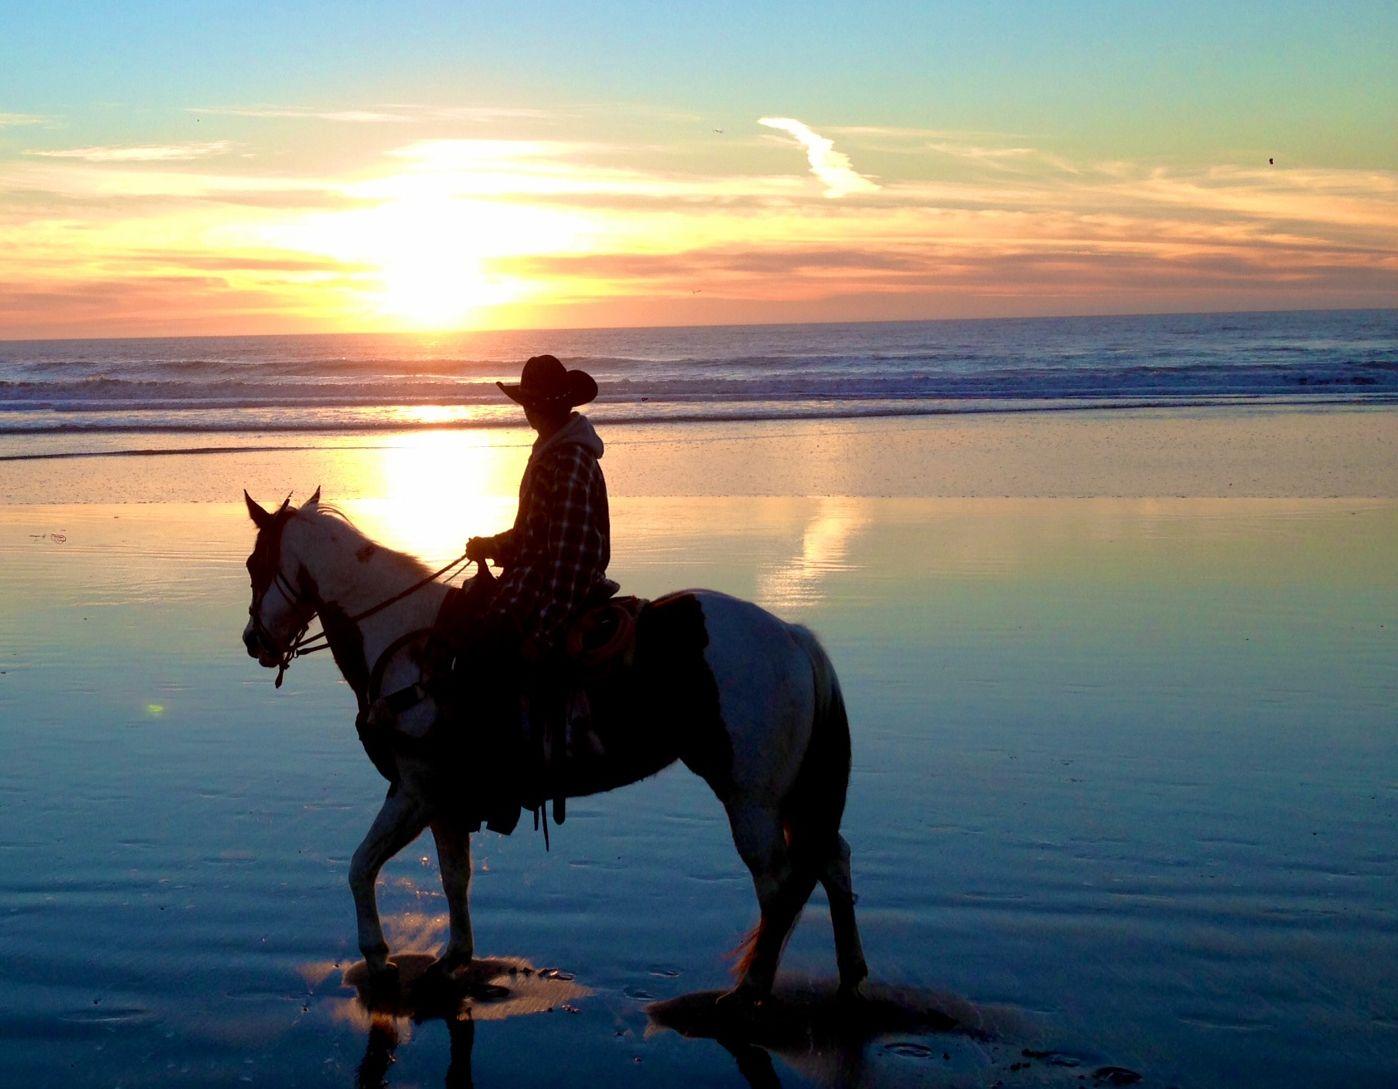 Mar Vista Les Horseback Riding On The Beach Daly City Ca San Francisco